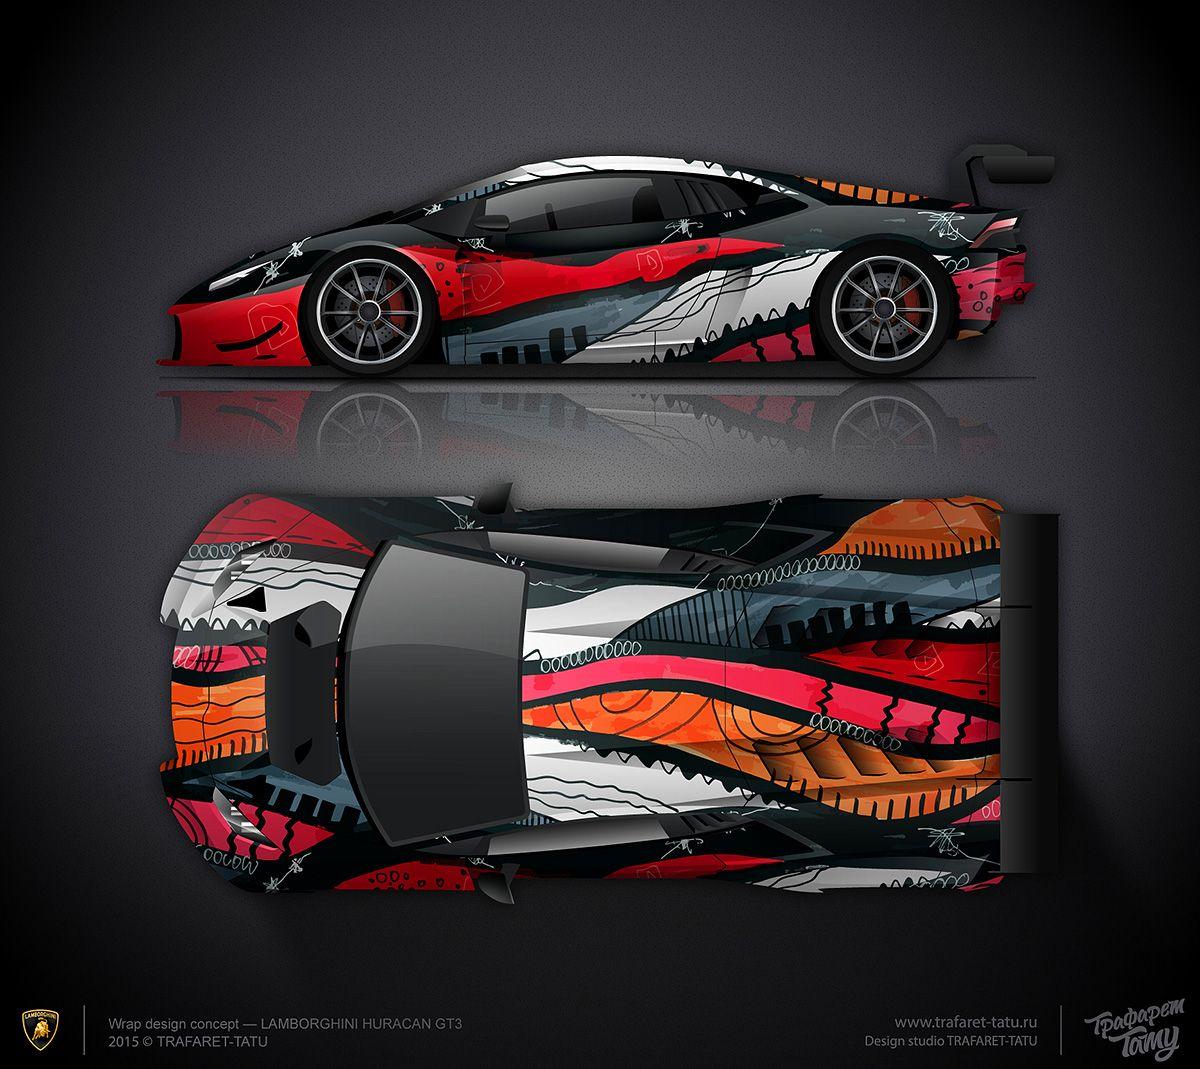 Wrap Design Concept #1 Artcar LAMBORGHINI HURACAN GT3 | Boston Life  Magazine | Pinterest | Lamborghini Huracan, Lamborghini And Cars